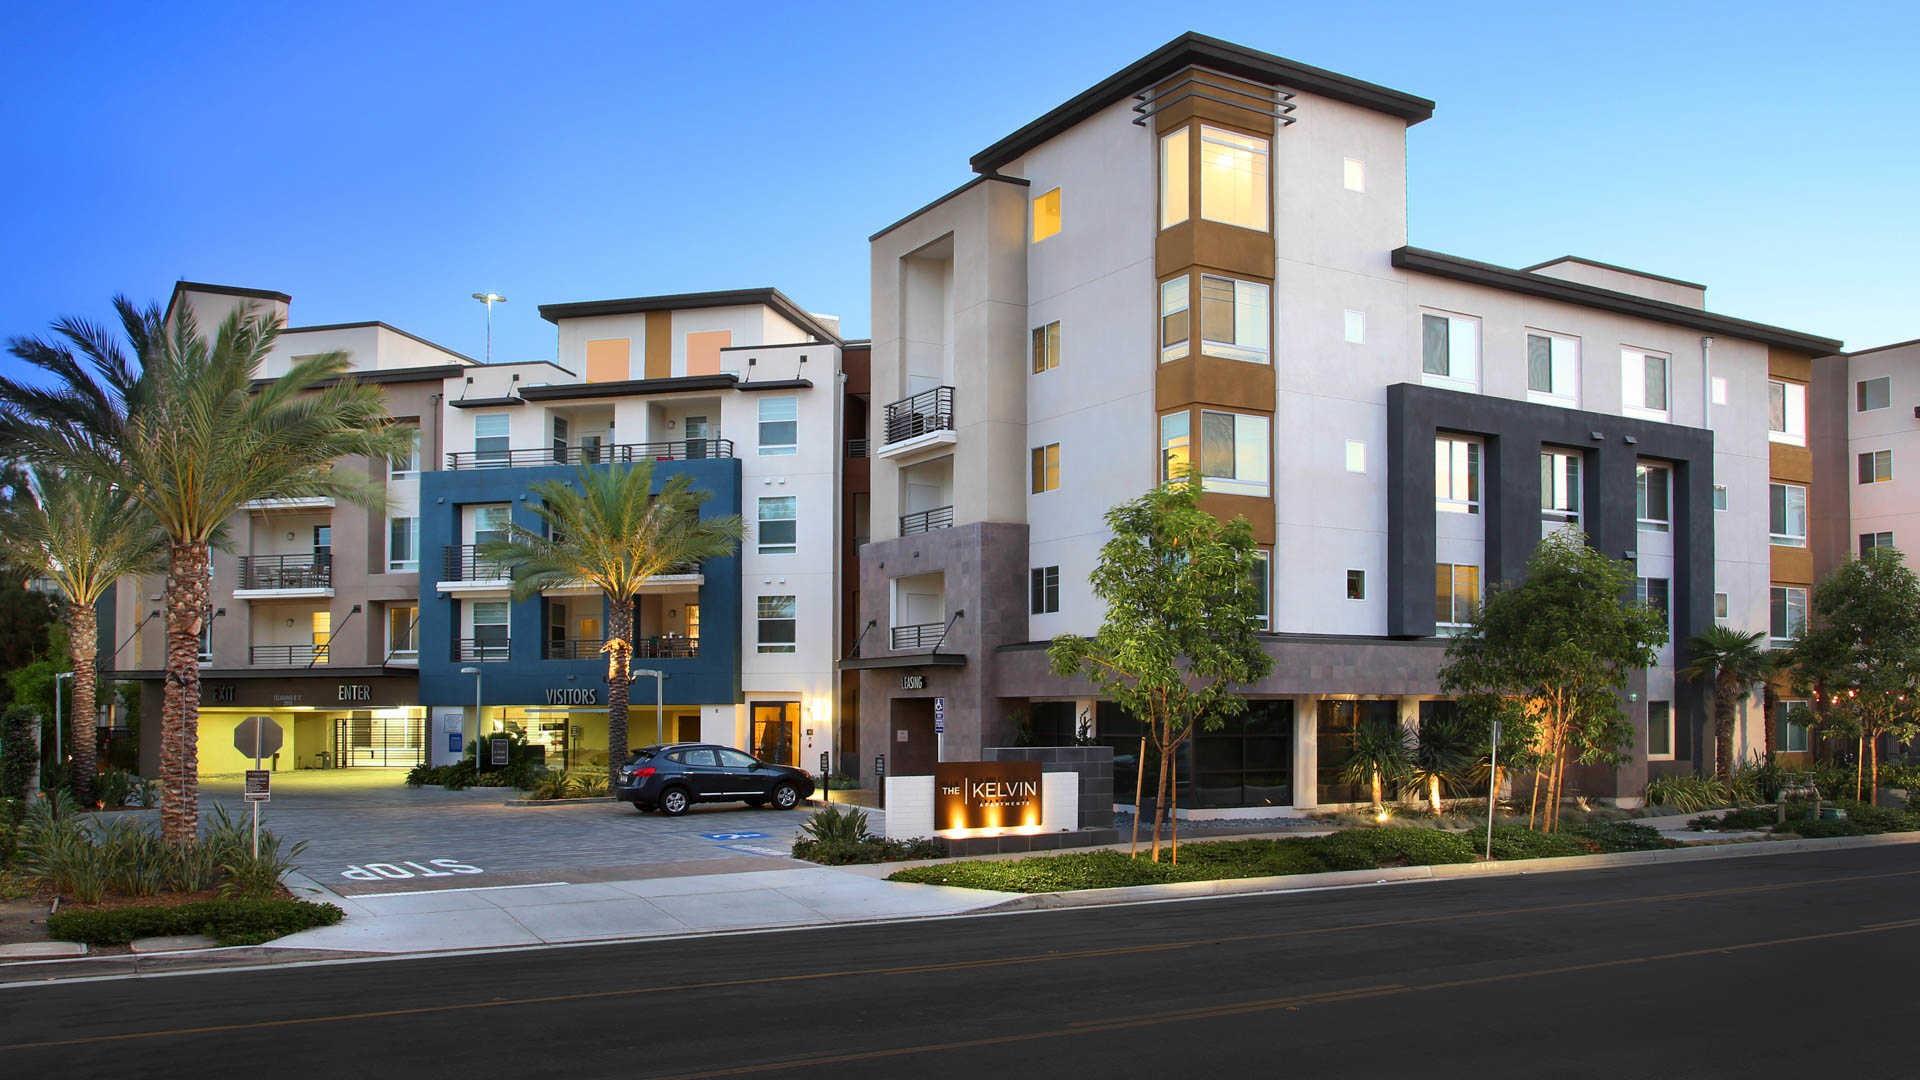 Apartments Near UC Irvine The Kelvin for University of California - Irvine Students in Irvine, CA